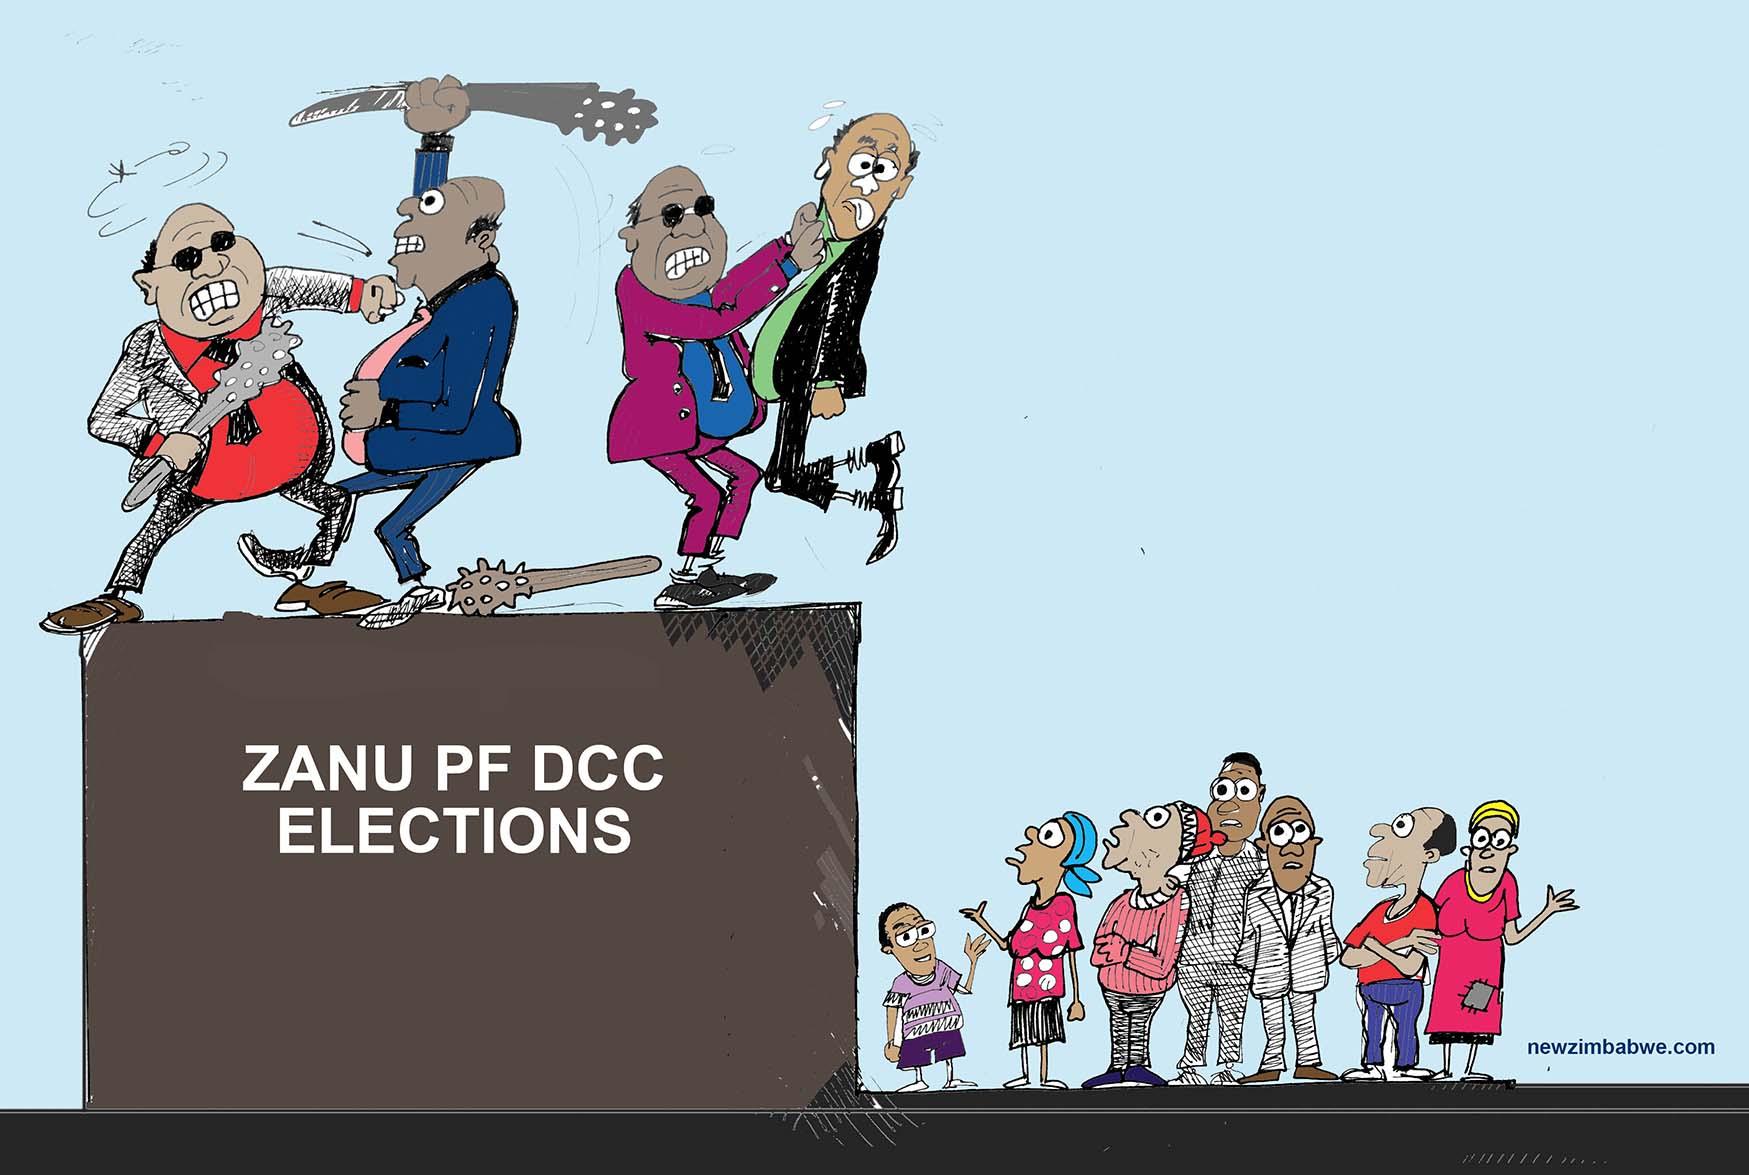 Violence mars ZANU PF DCC elections